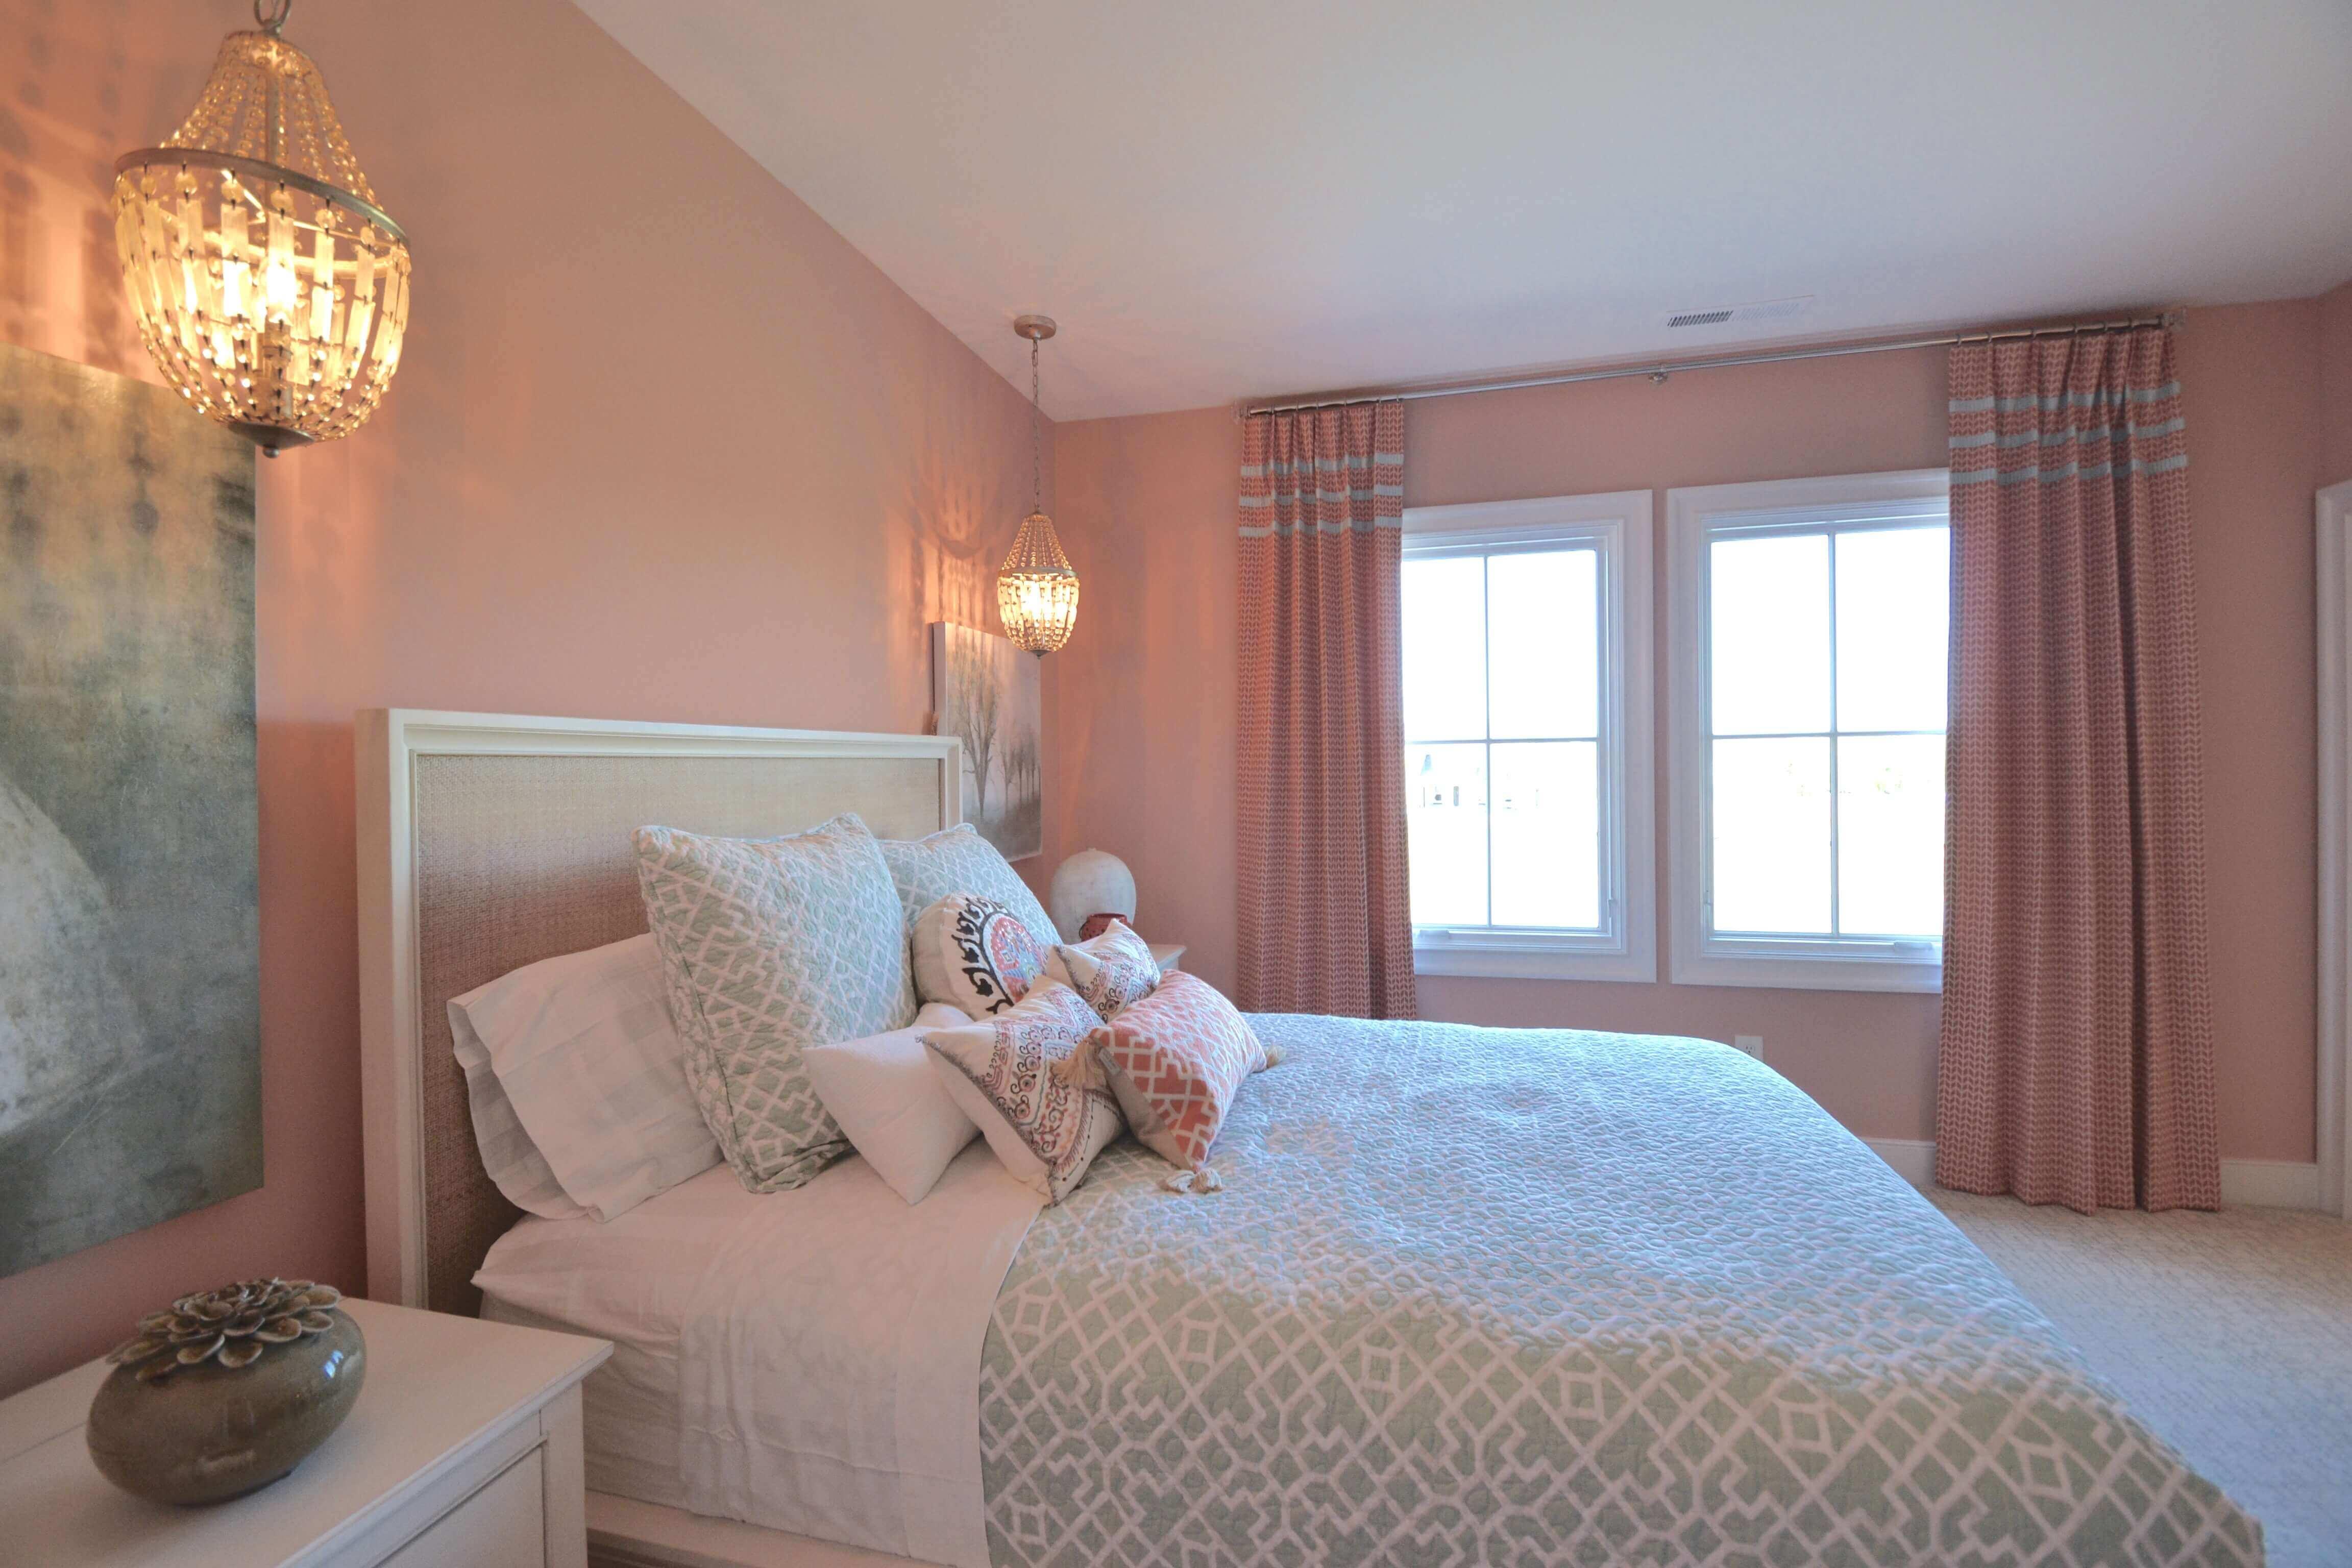 Gradison Master Bedroom